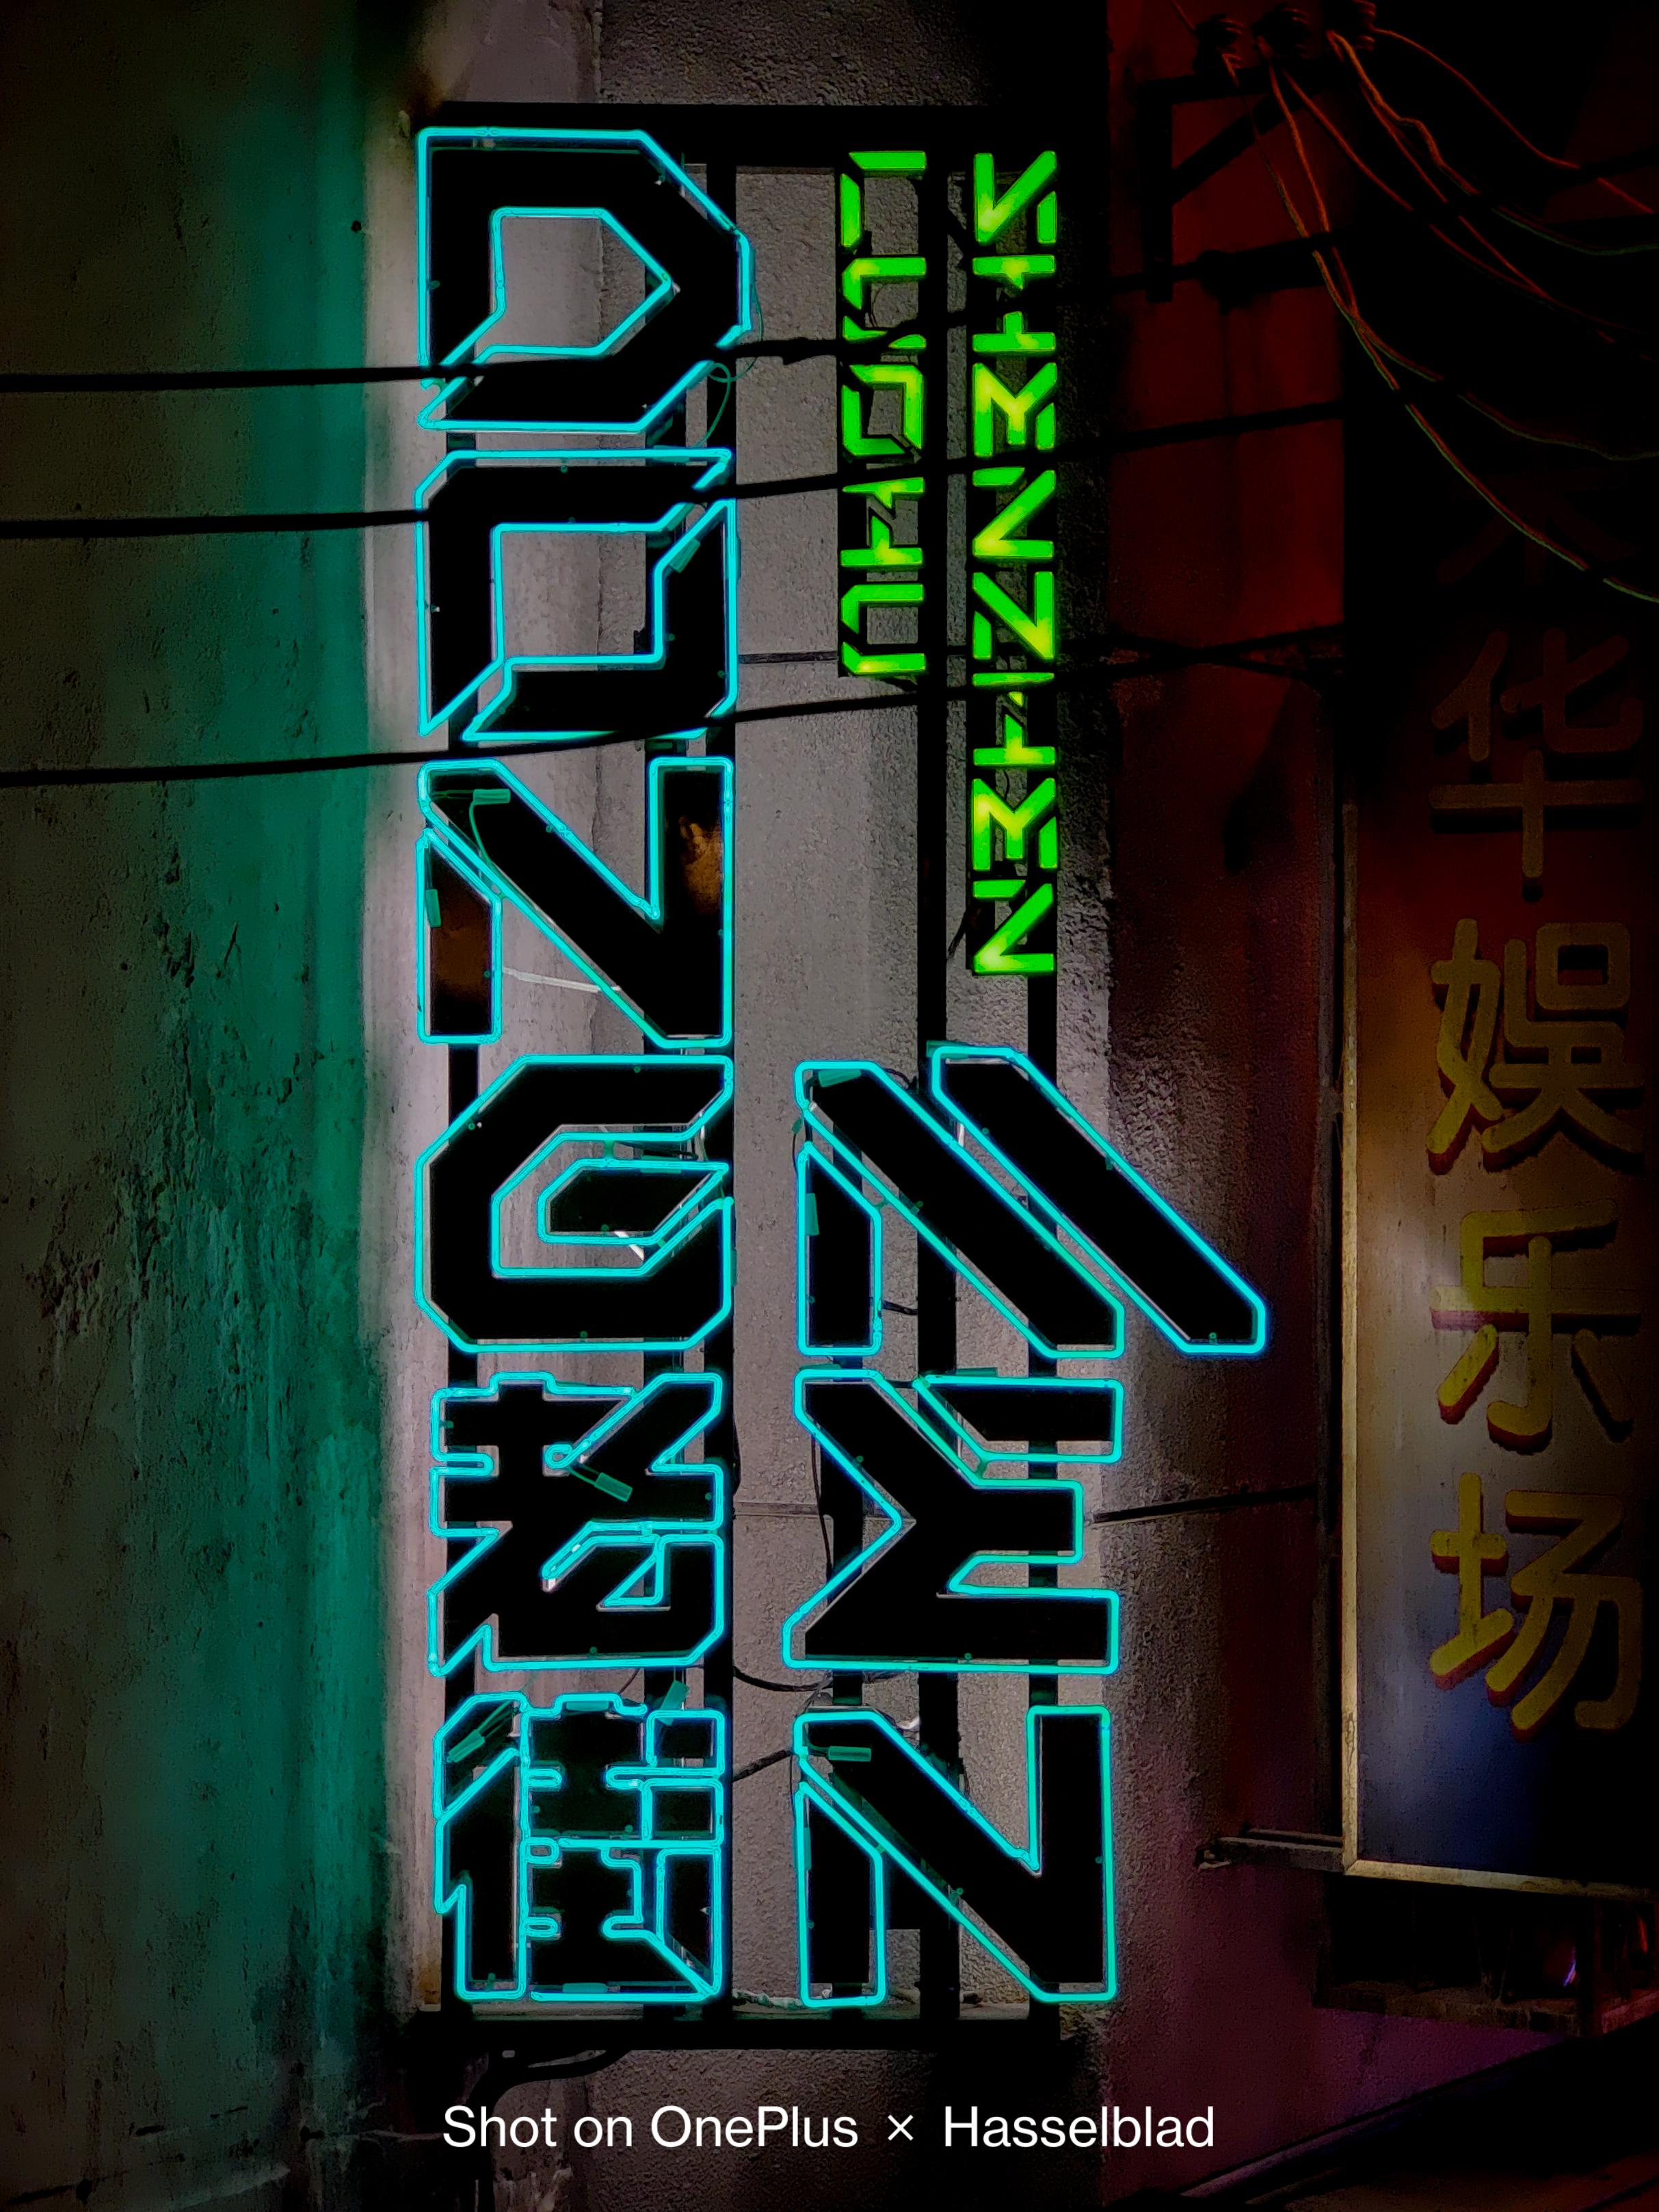 IMG_20210502_192252.jpg